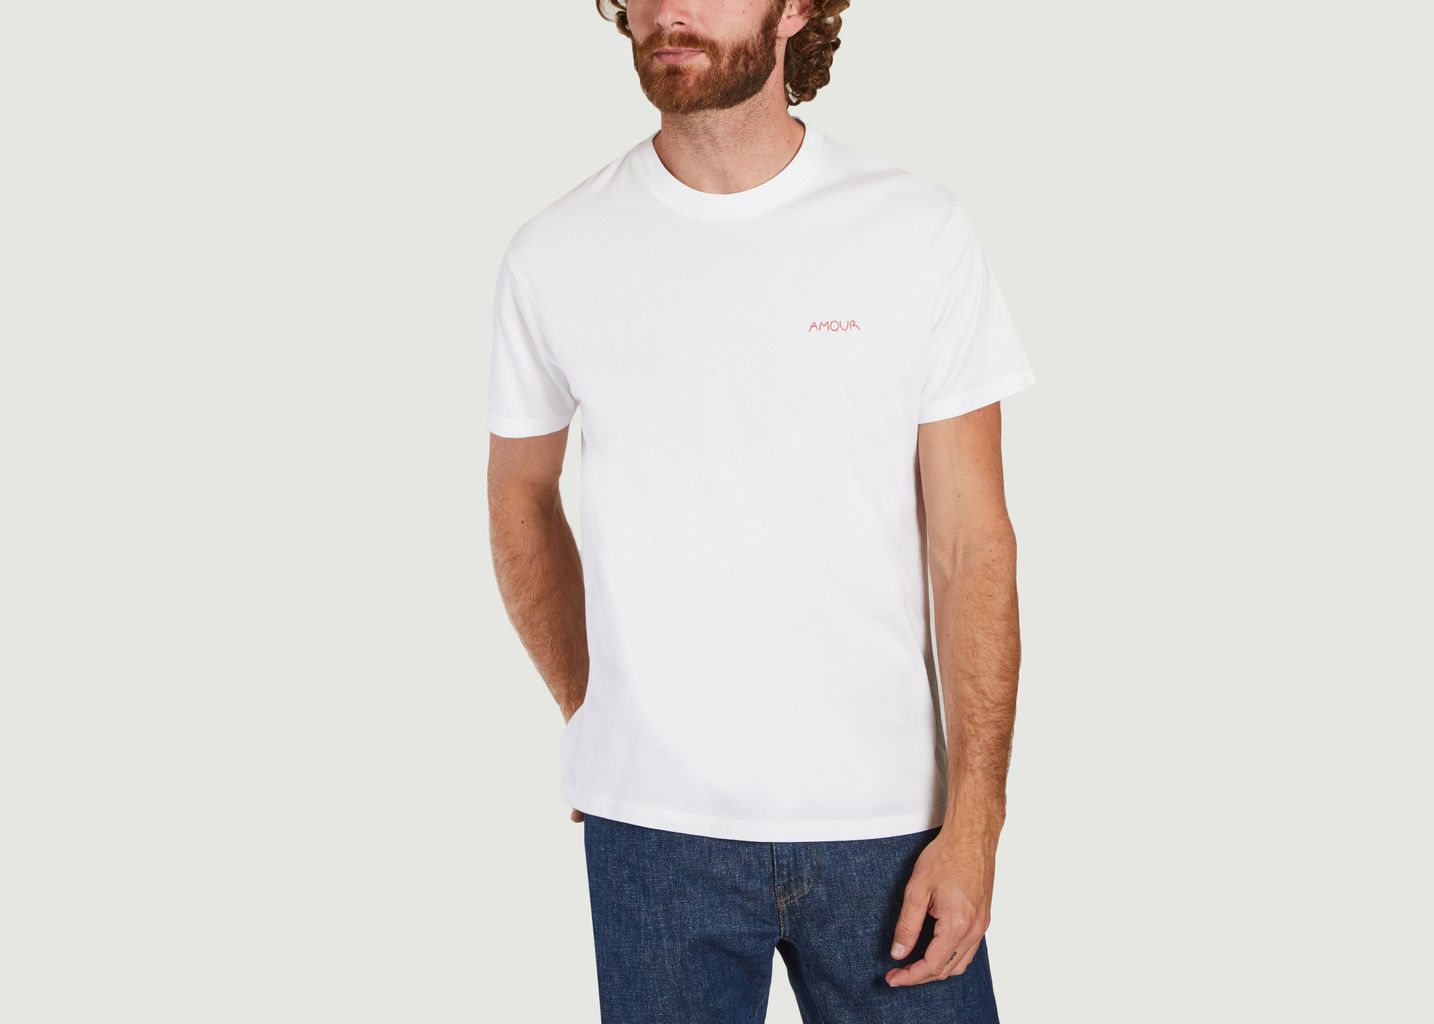 Tee-shirt popincourt amour - Maison Labiche